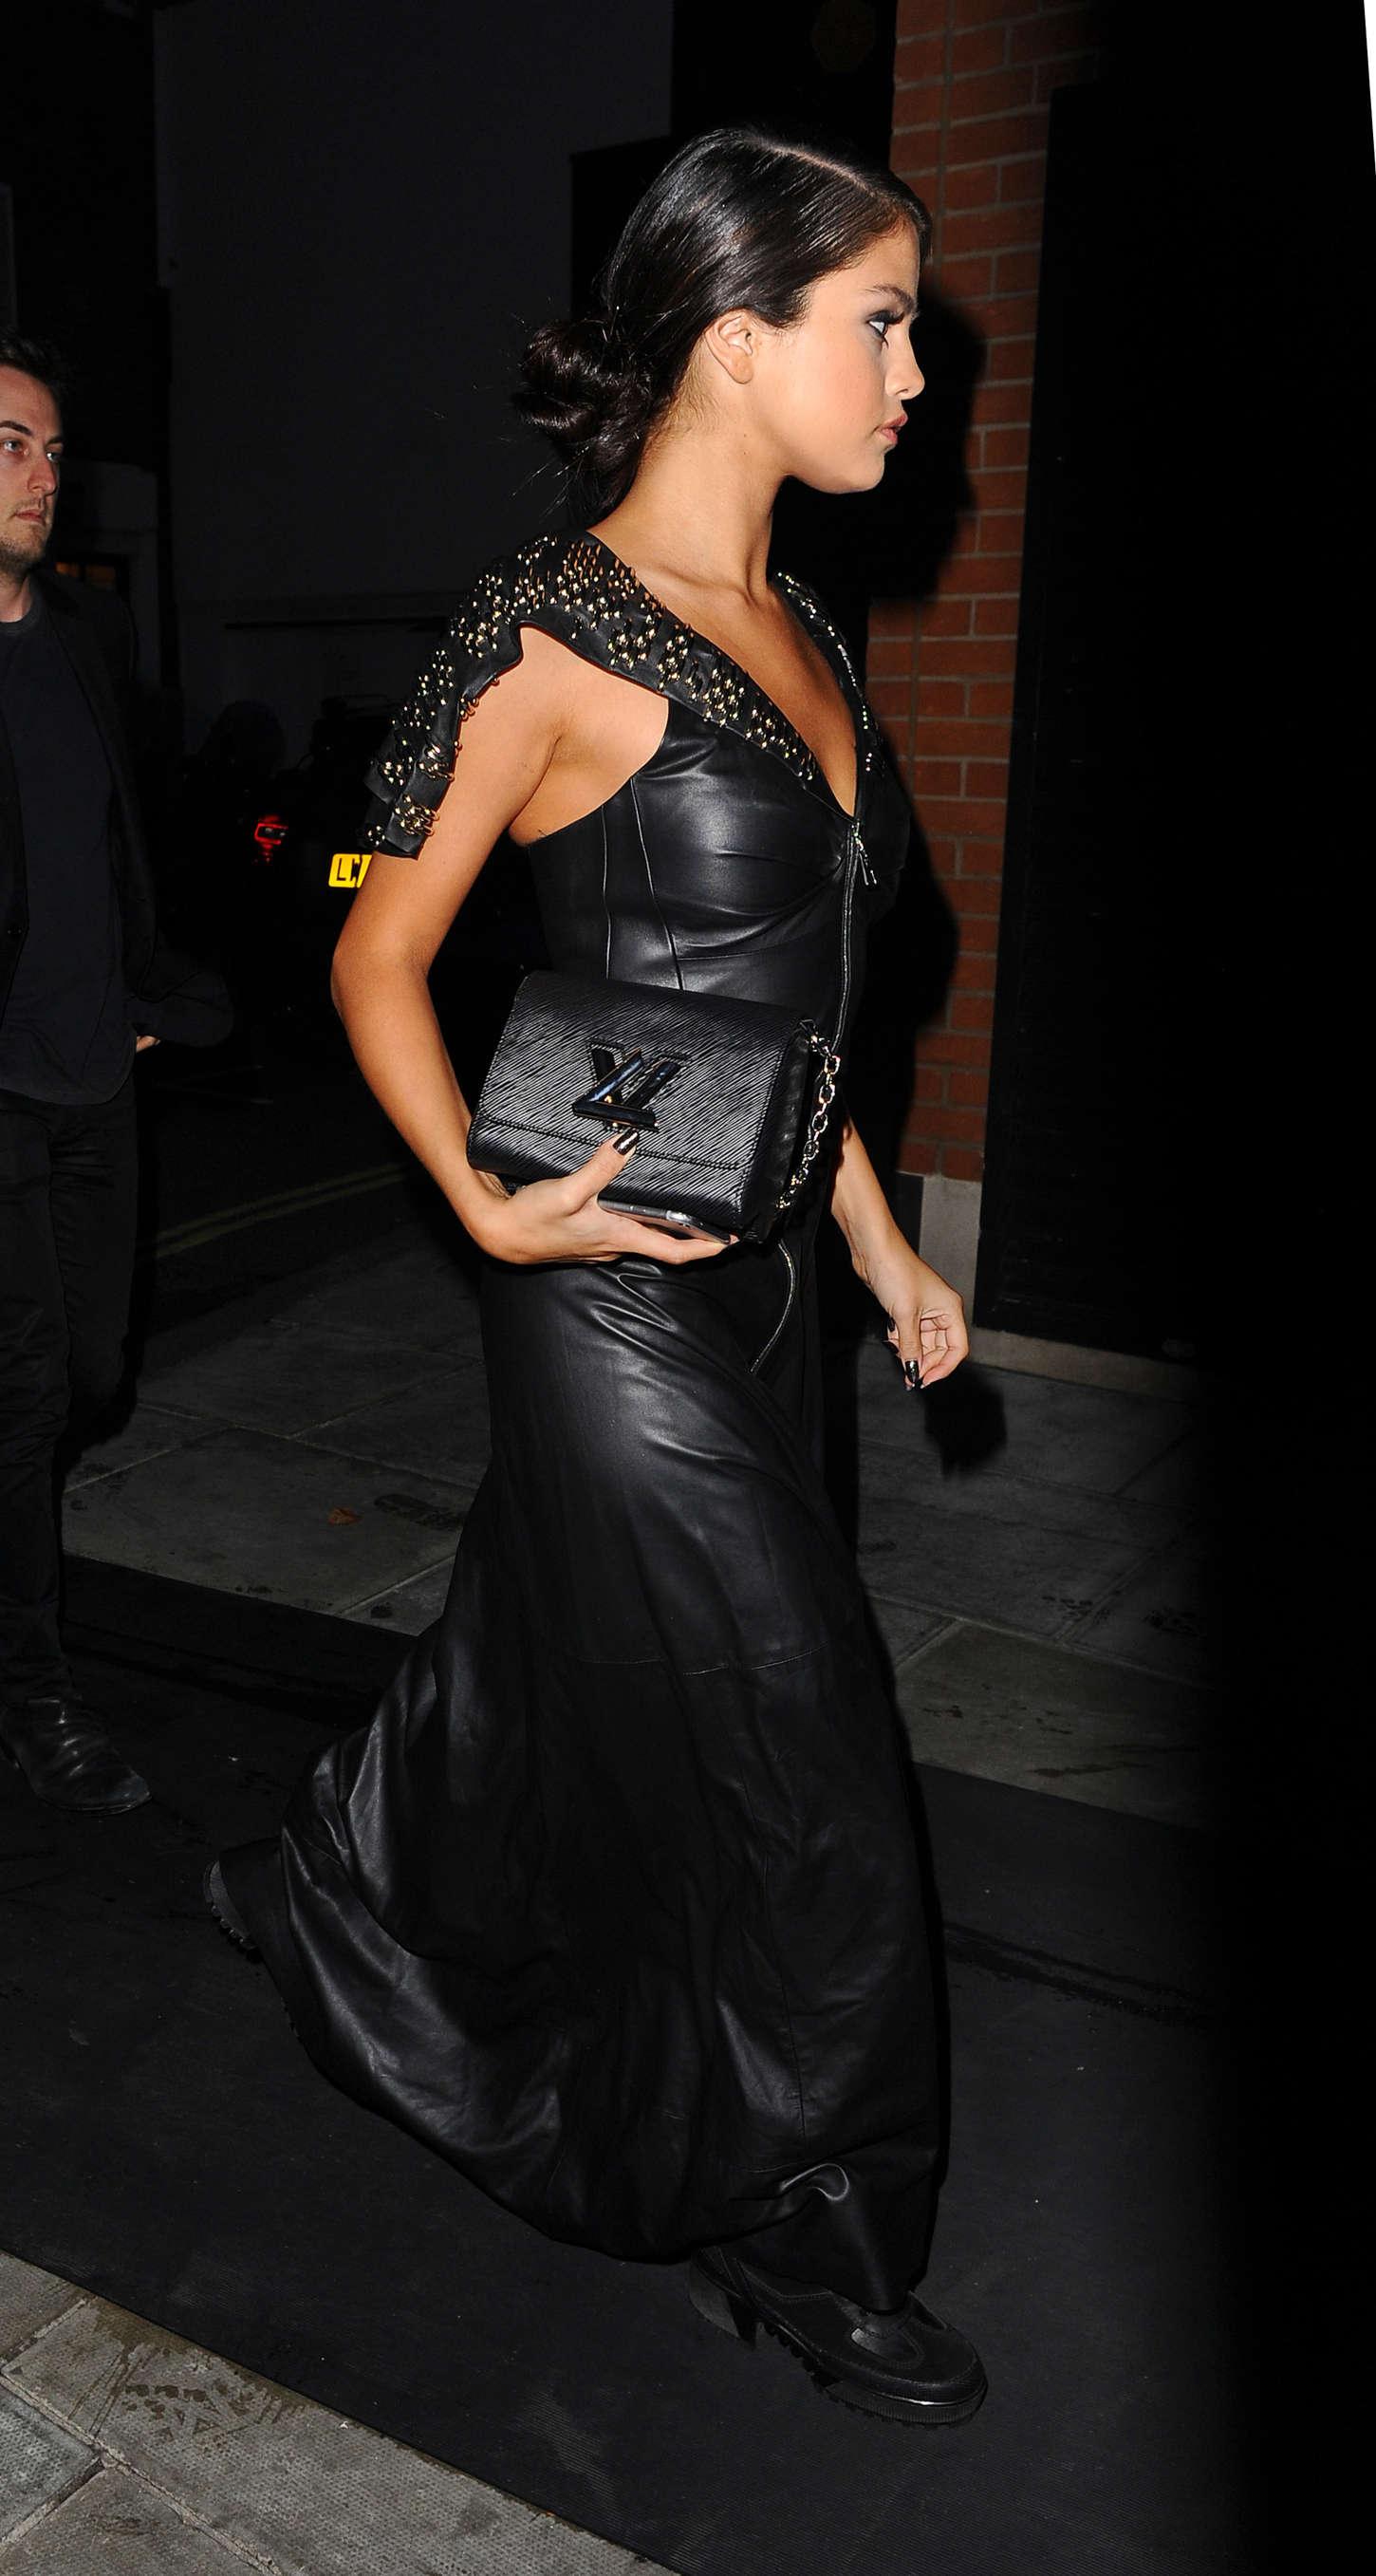 Selena Gomez In Black Leather Dress 02 Gotceleb